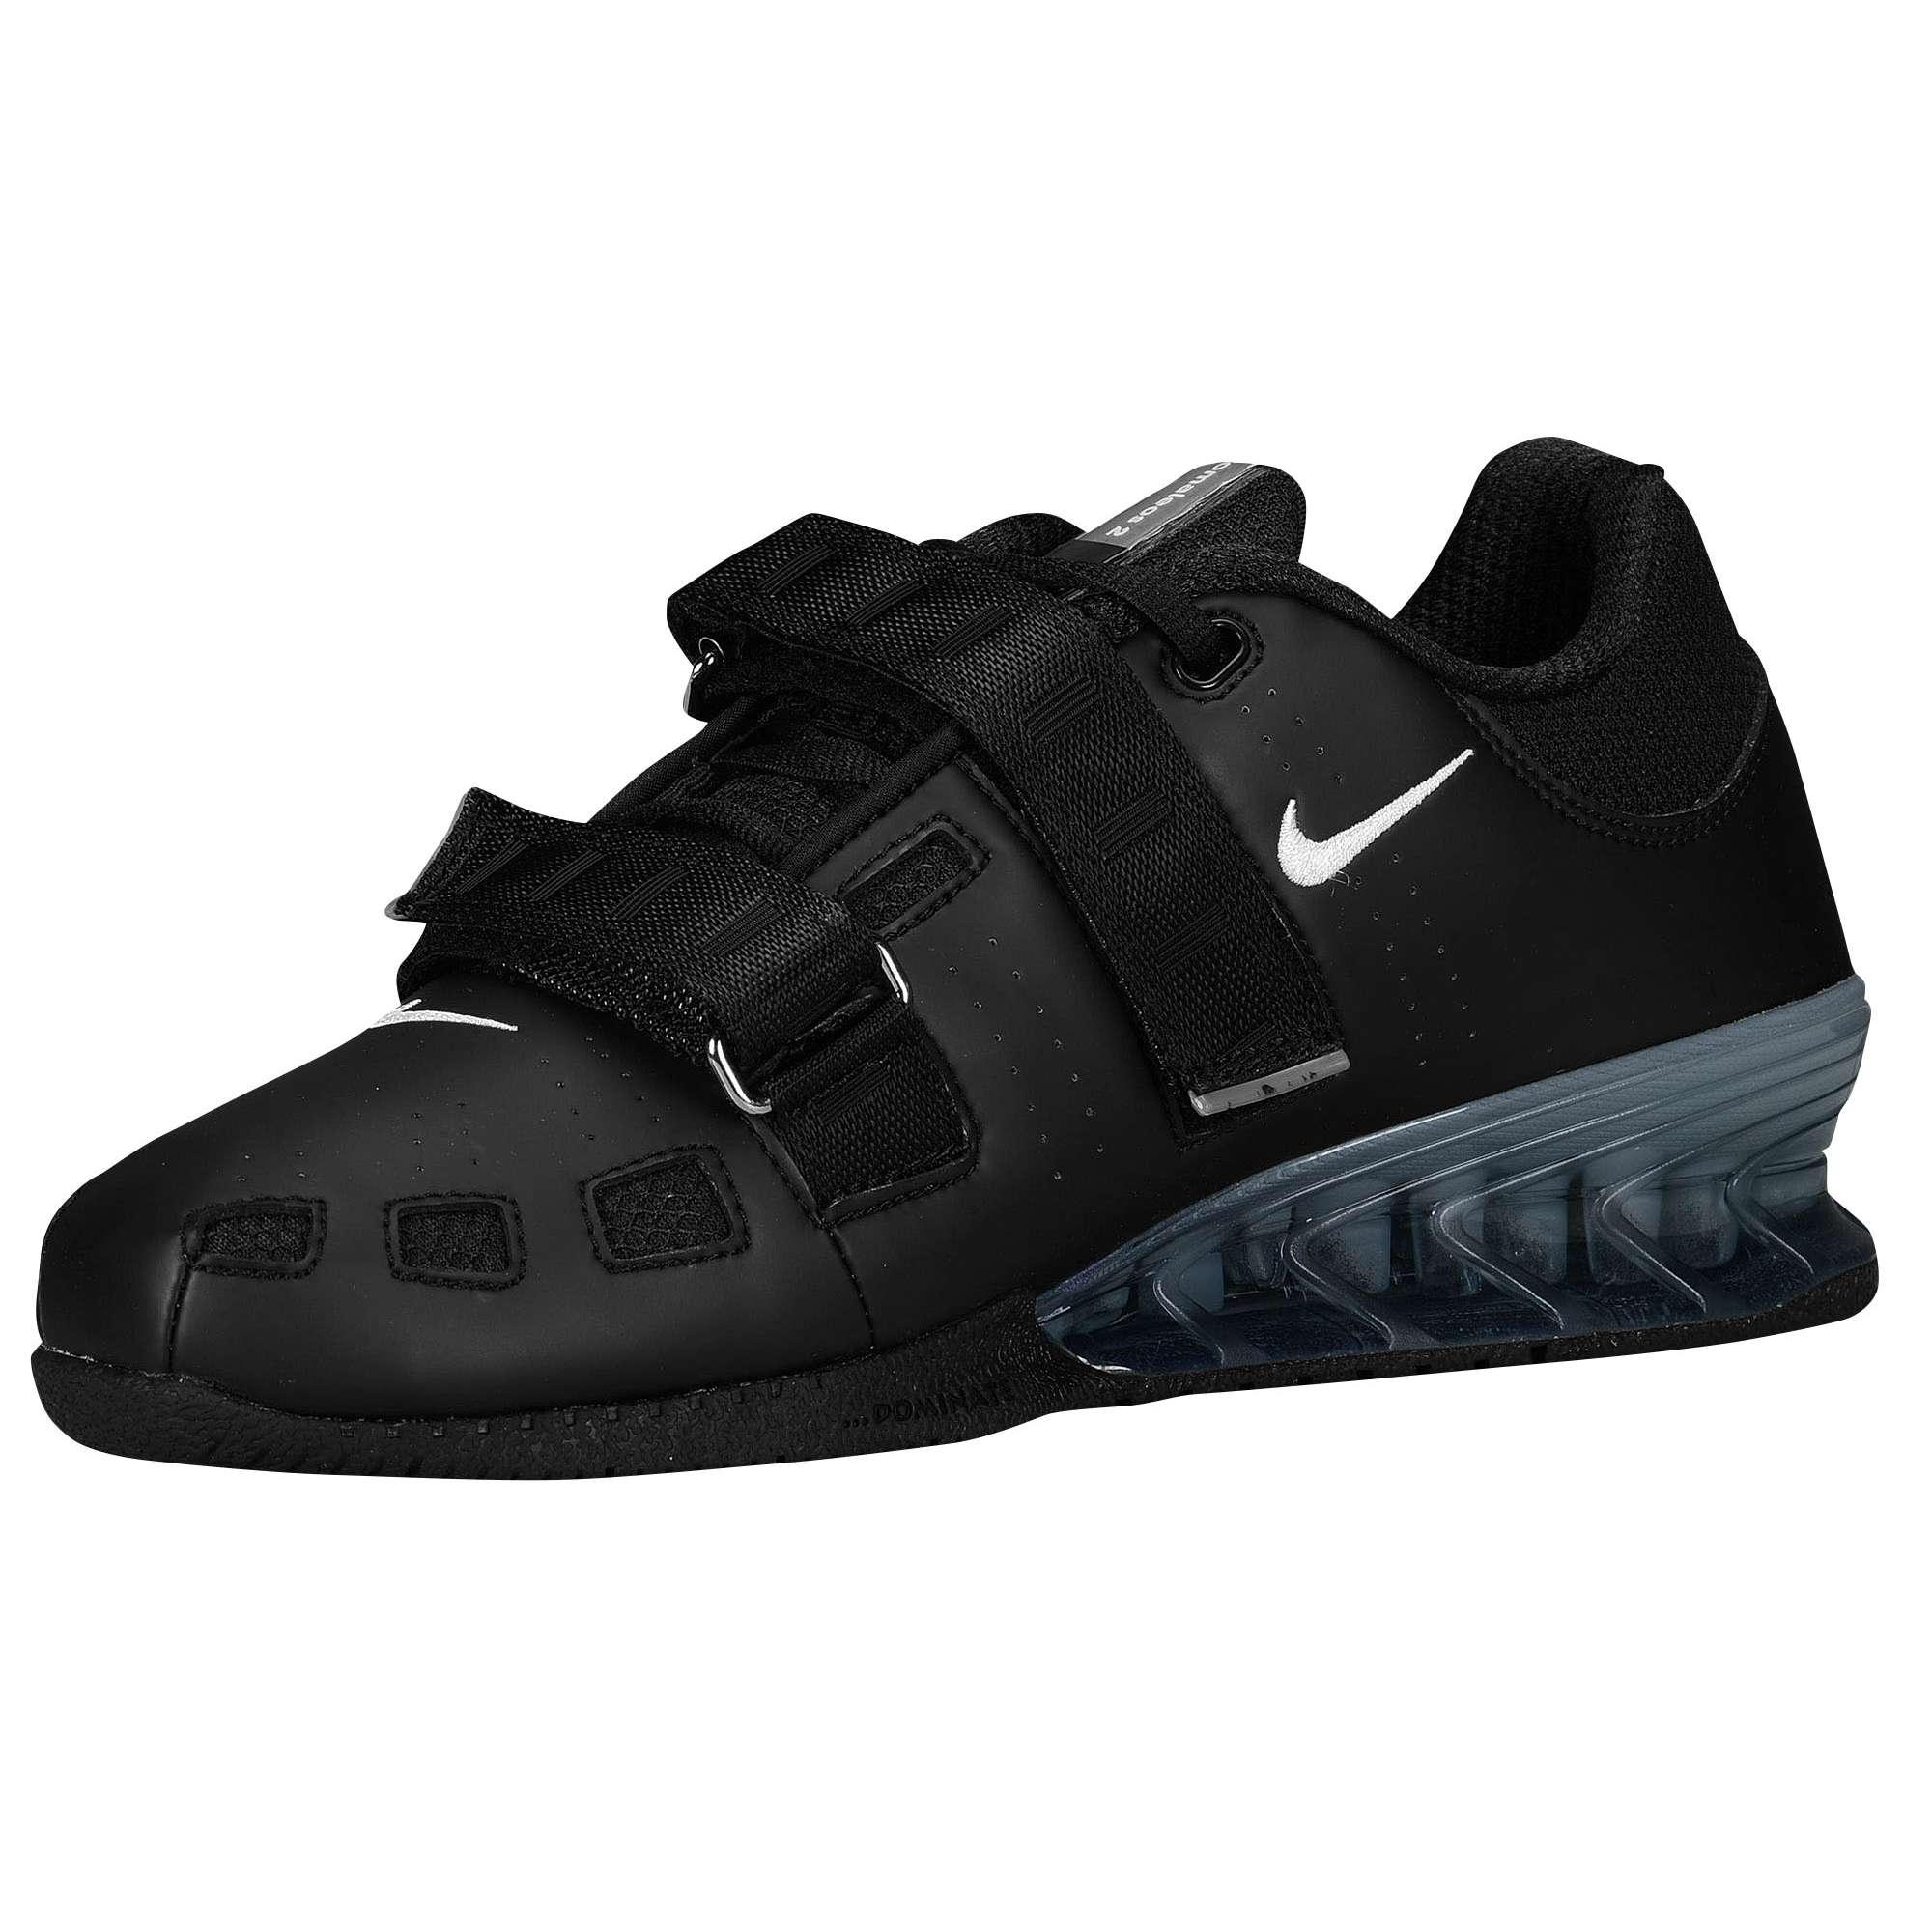 ... Nike Romaleos 2 (Zwart) - Zijaanzicht (Binnenkant) ...